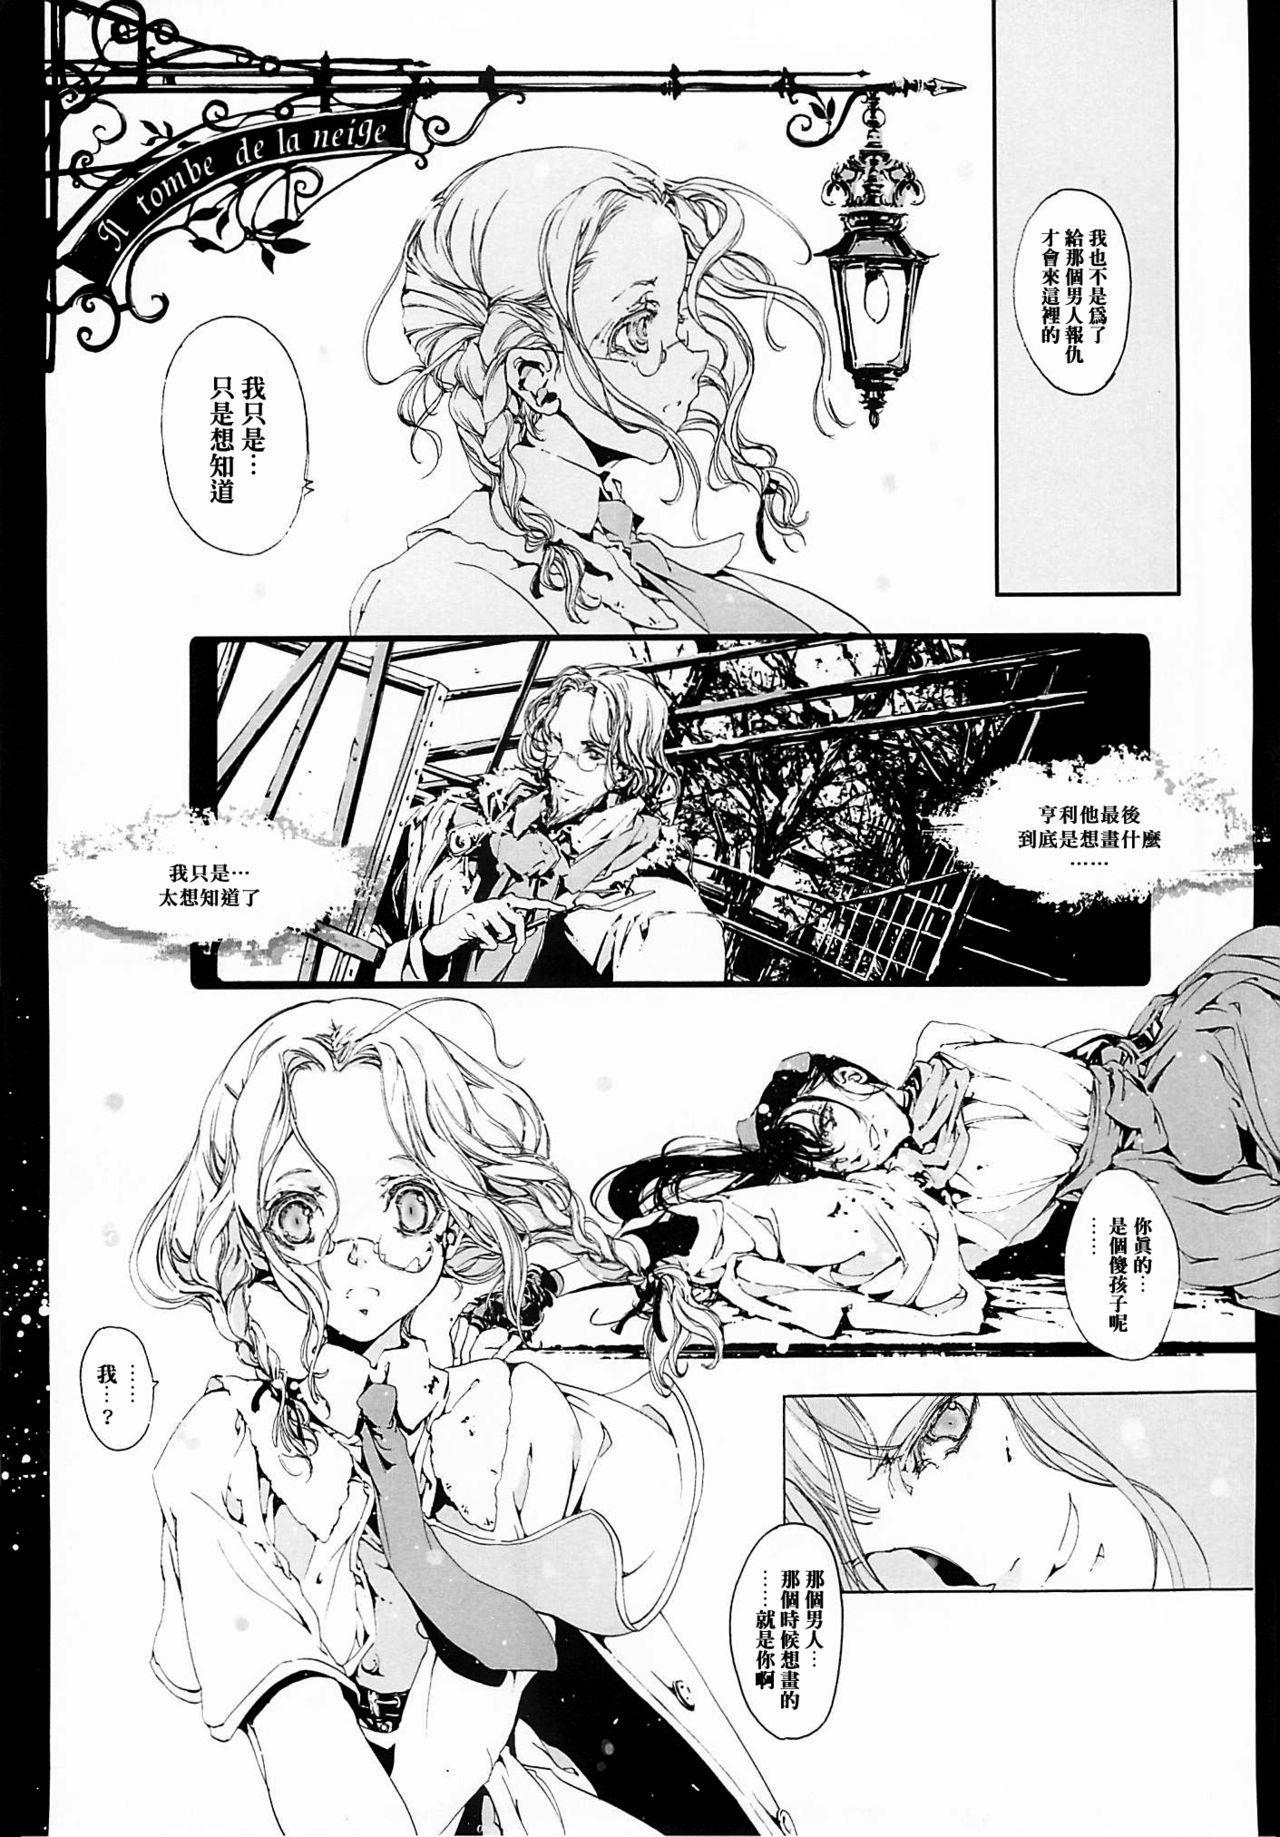 (CR37) [70 Nenshiki Yuukyuu Kikan (Endou Okito)] ORGAN-Tino  01-02[Chinese] [拾荒者汉化组] [Incomplete] 55